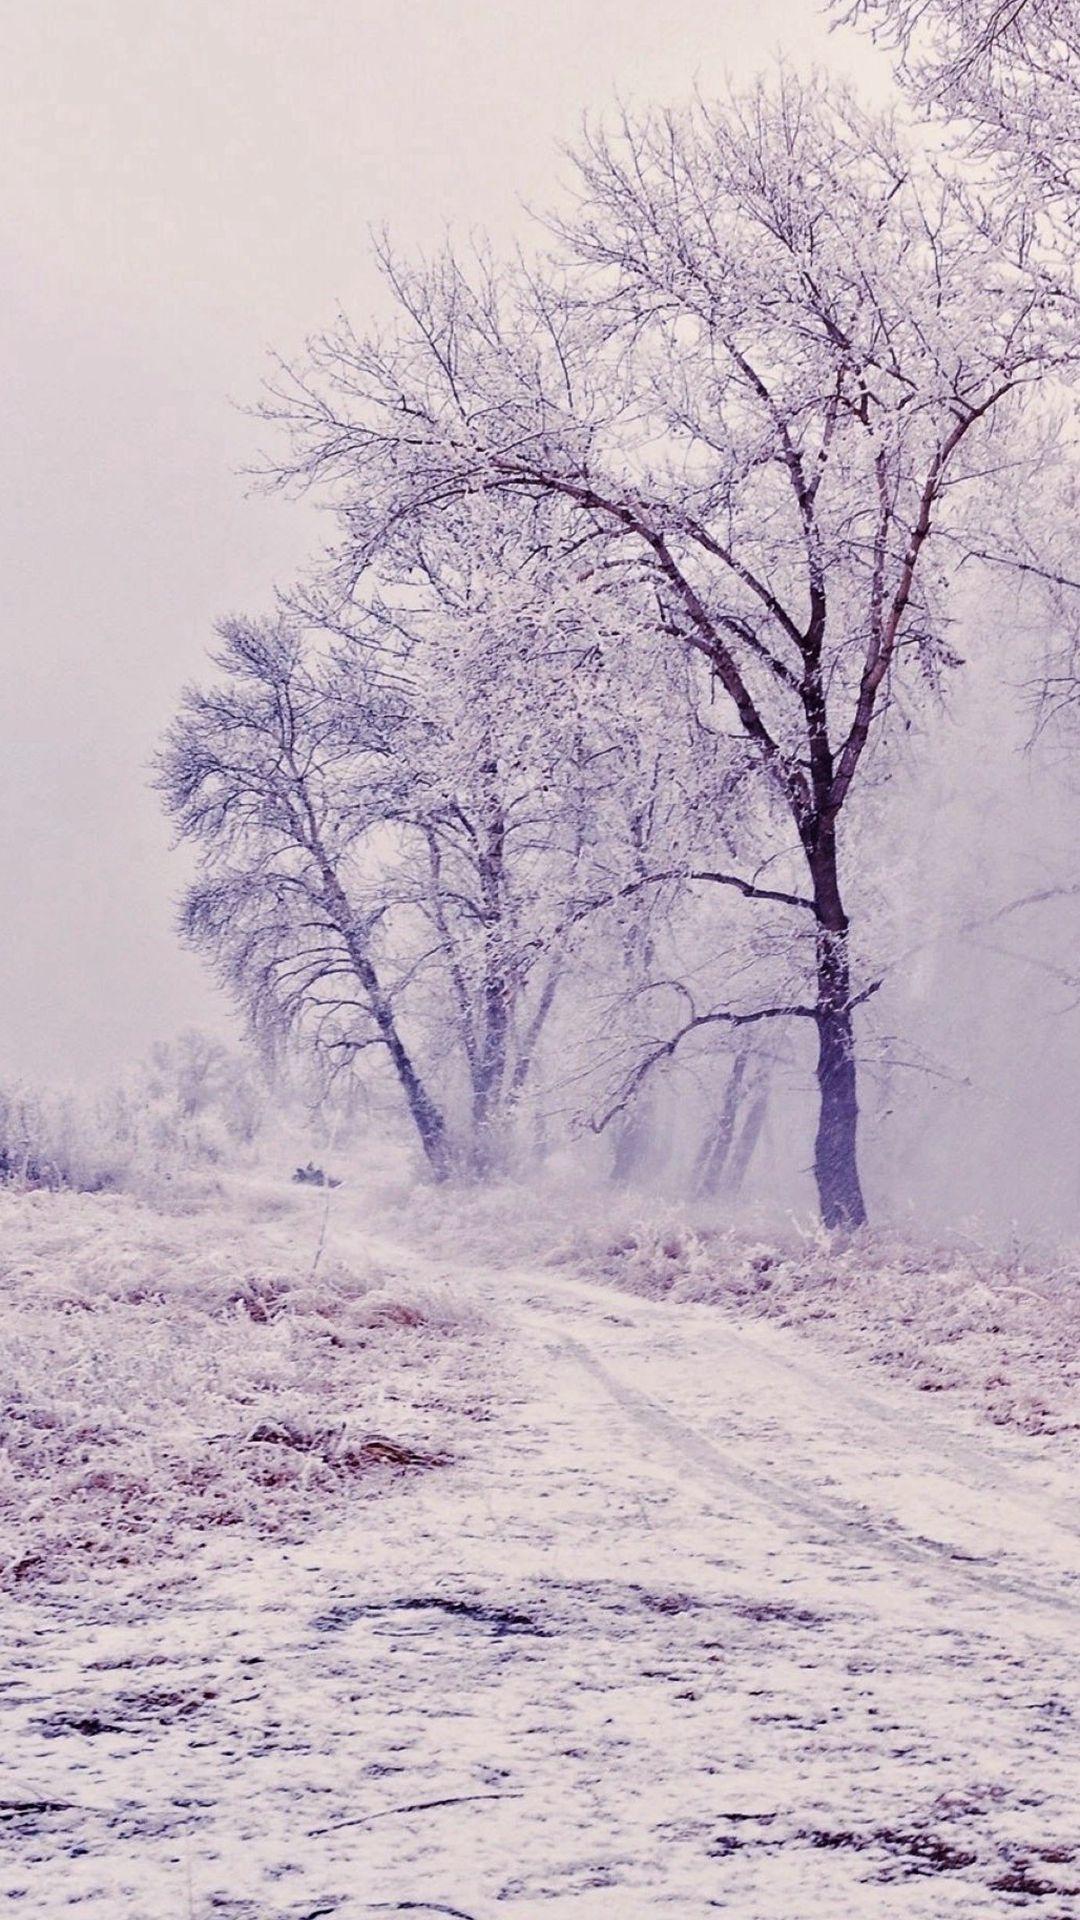 Wallpaper iphone winter - Winter Path Trees Landscape Iphone 6 Wallpaper